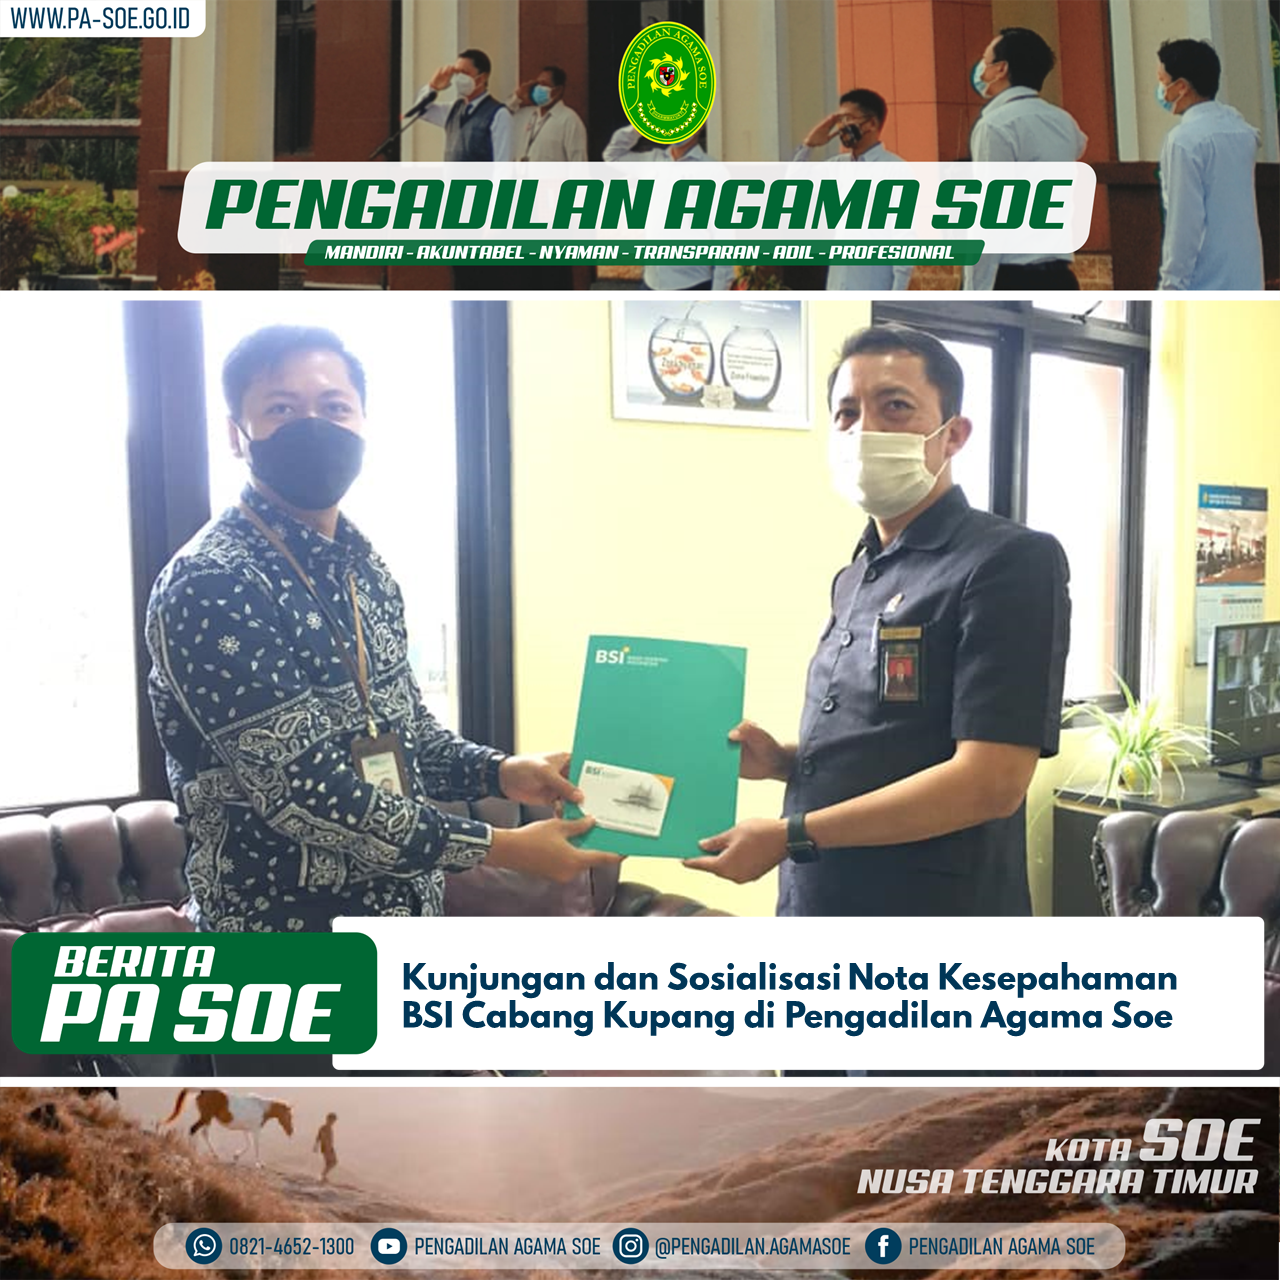 Bank Syariah Indonesia Cabang Kupang Berbagi Pengalaman dengan PA Soe